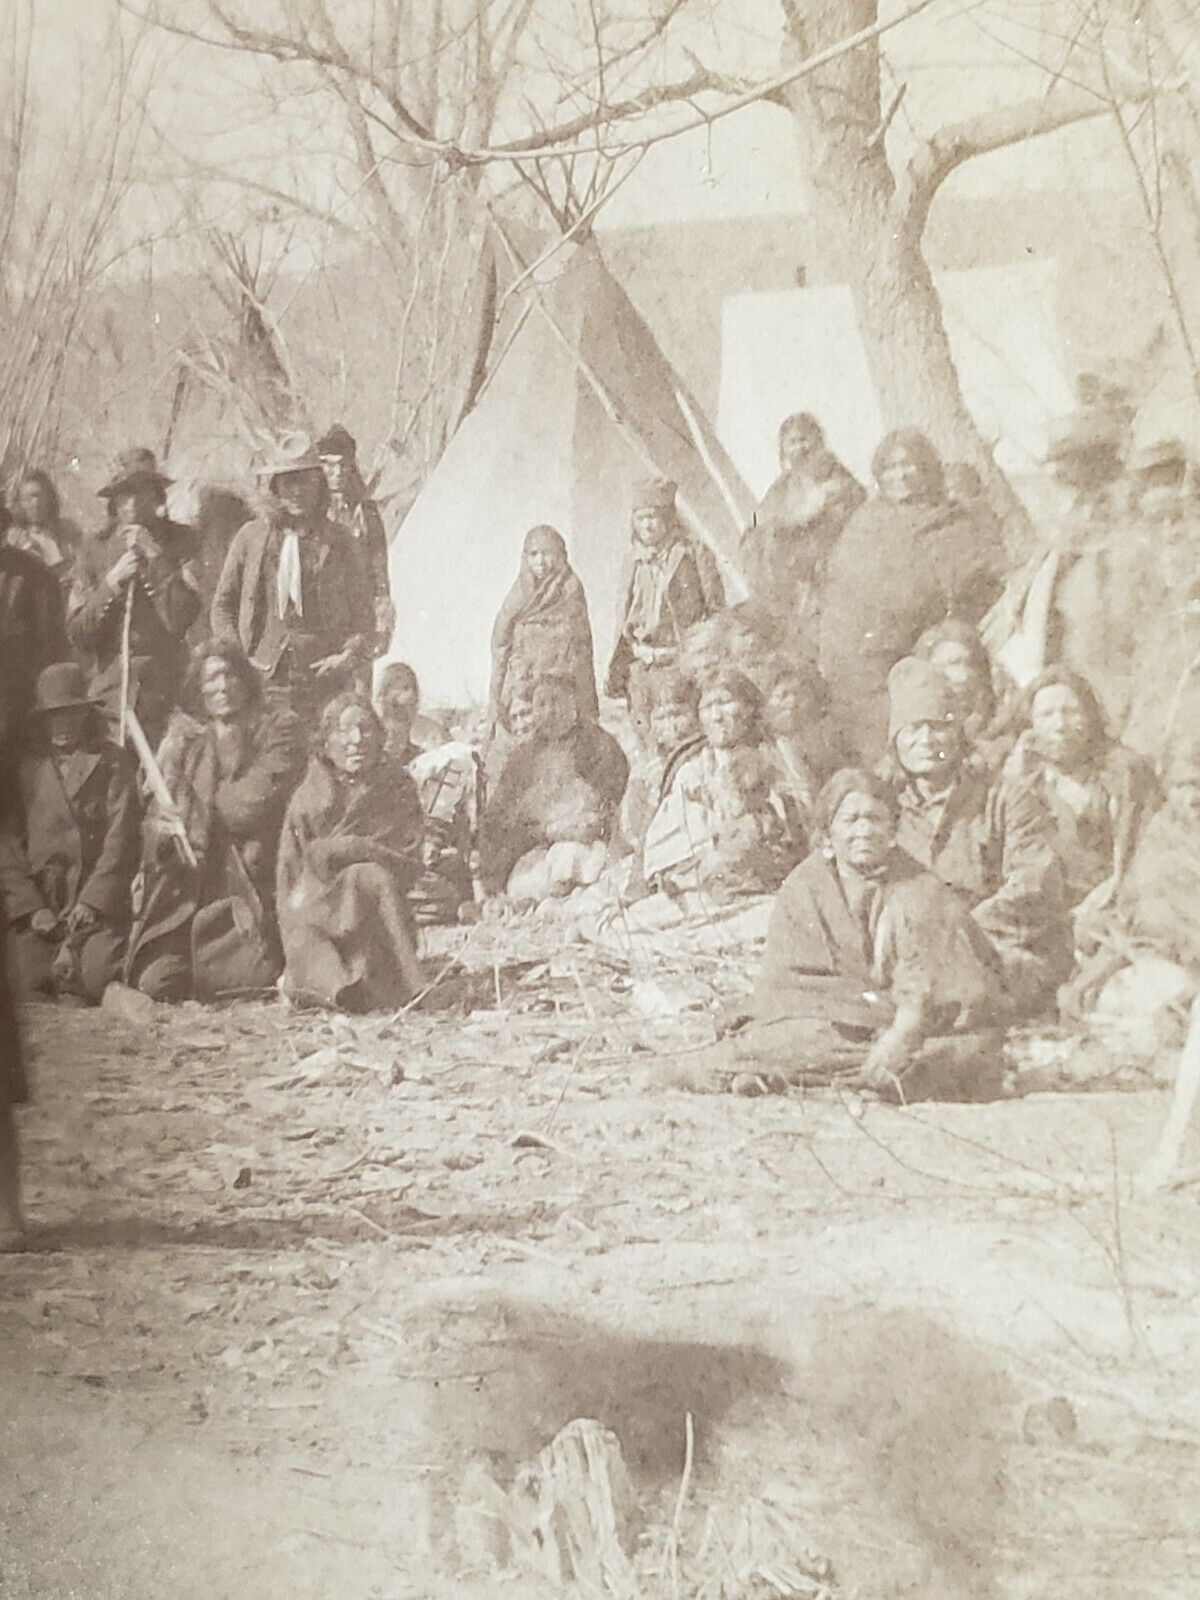 http://www.american-tribes.com/messageboards/dietmar/1891woundedknee5.jpg